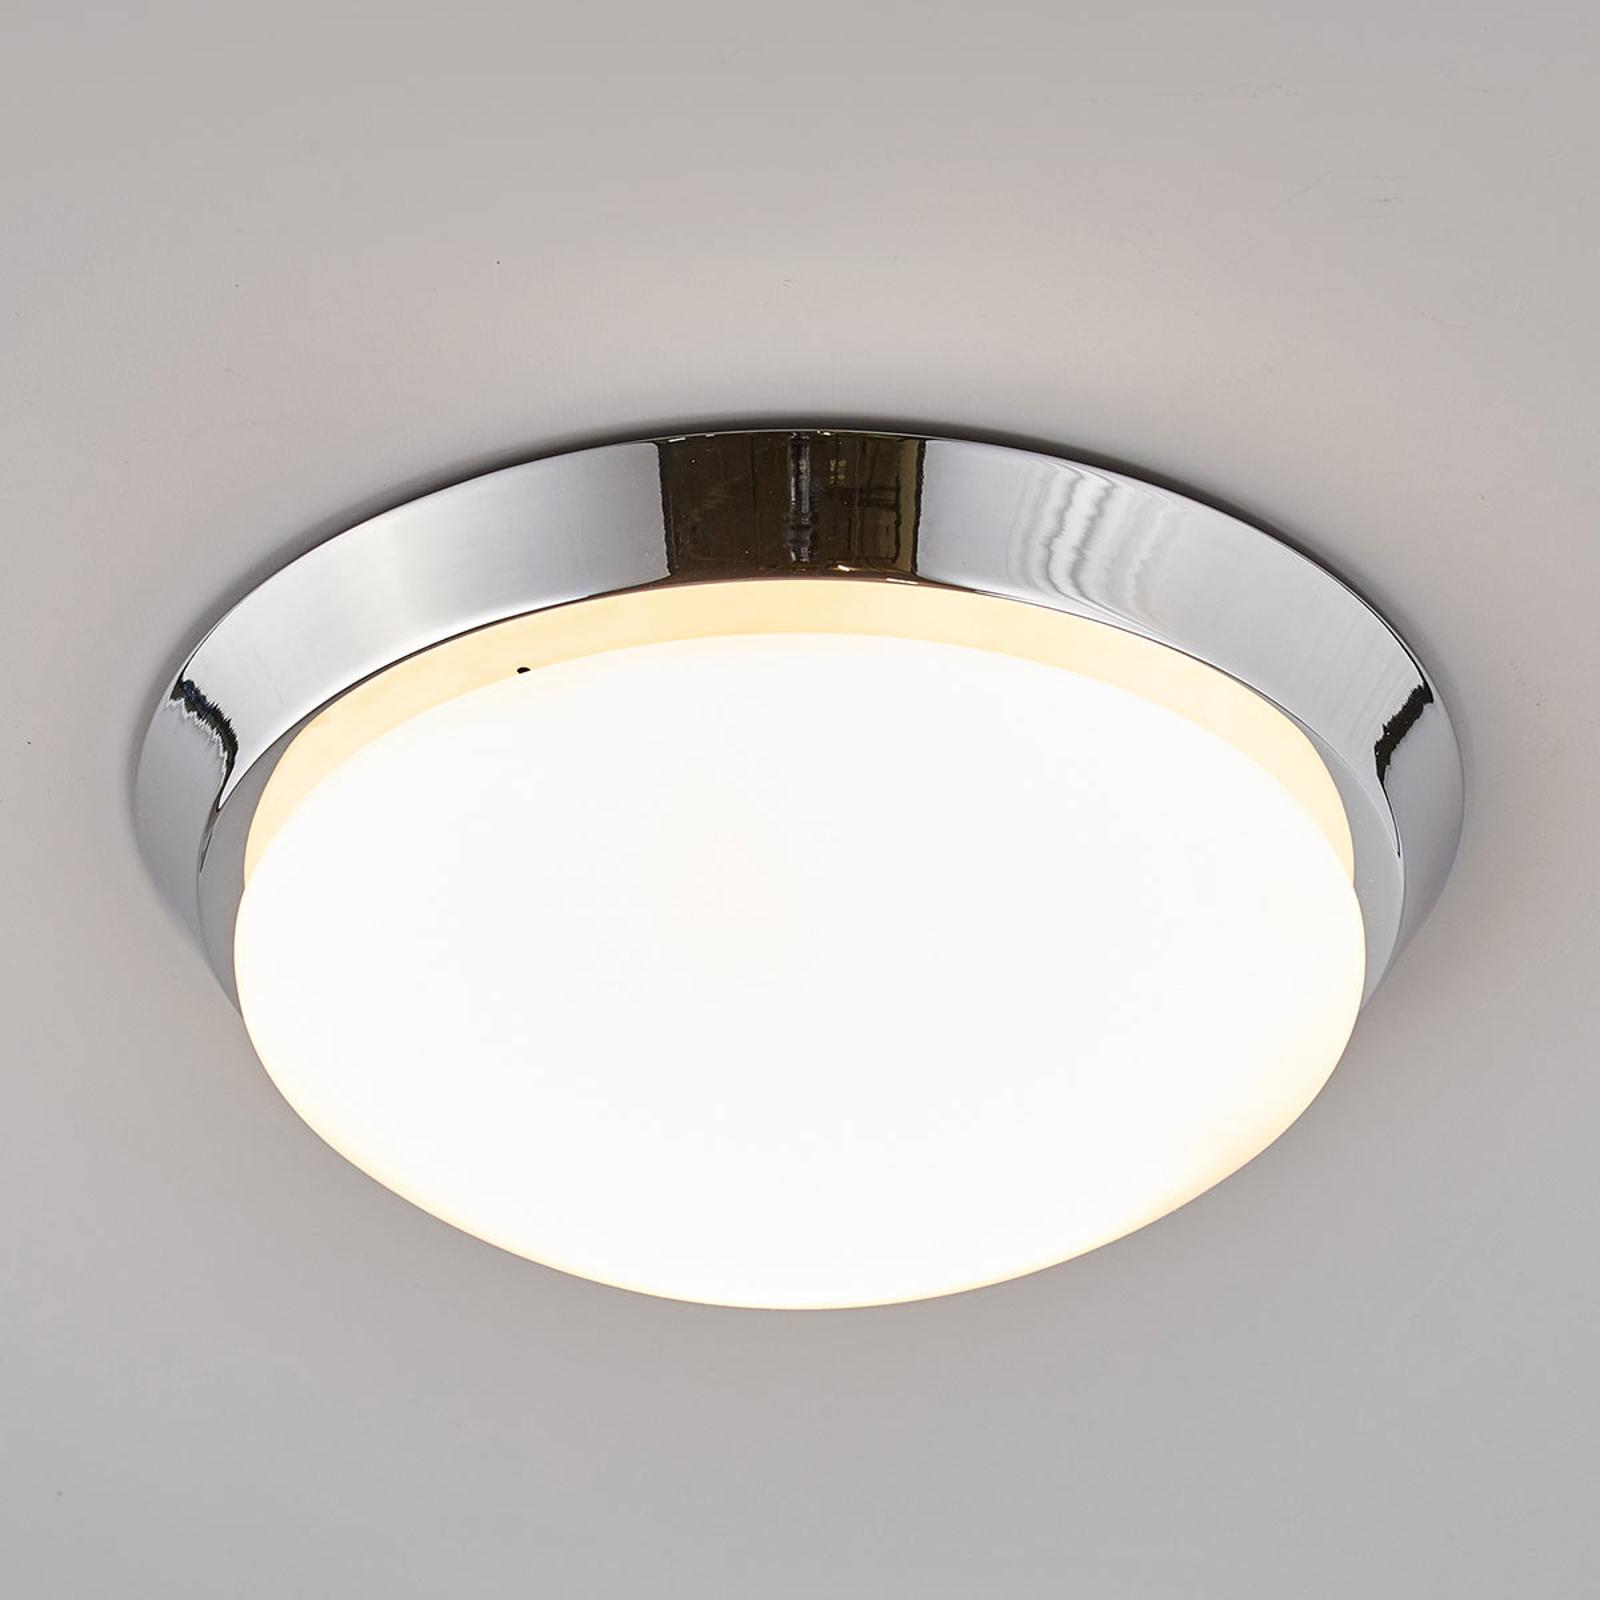 Ronde plafondlamp Dilani voor de badkamer